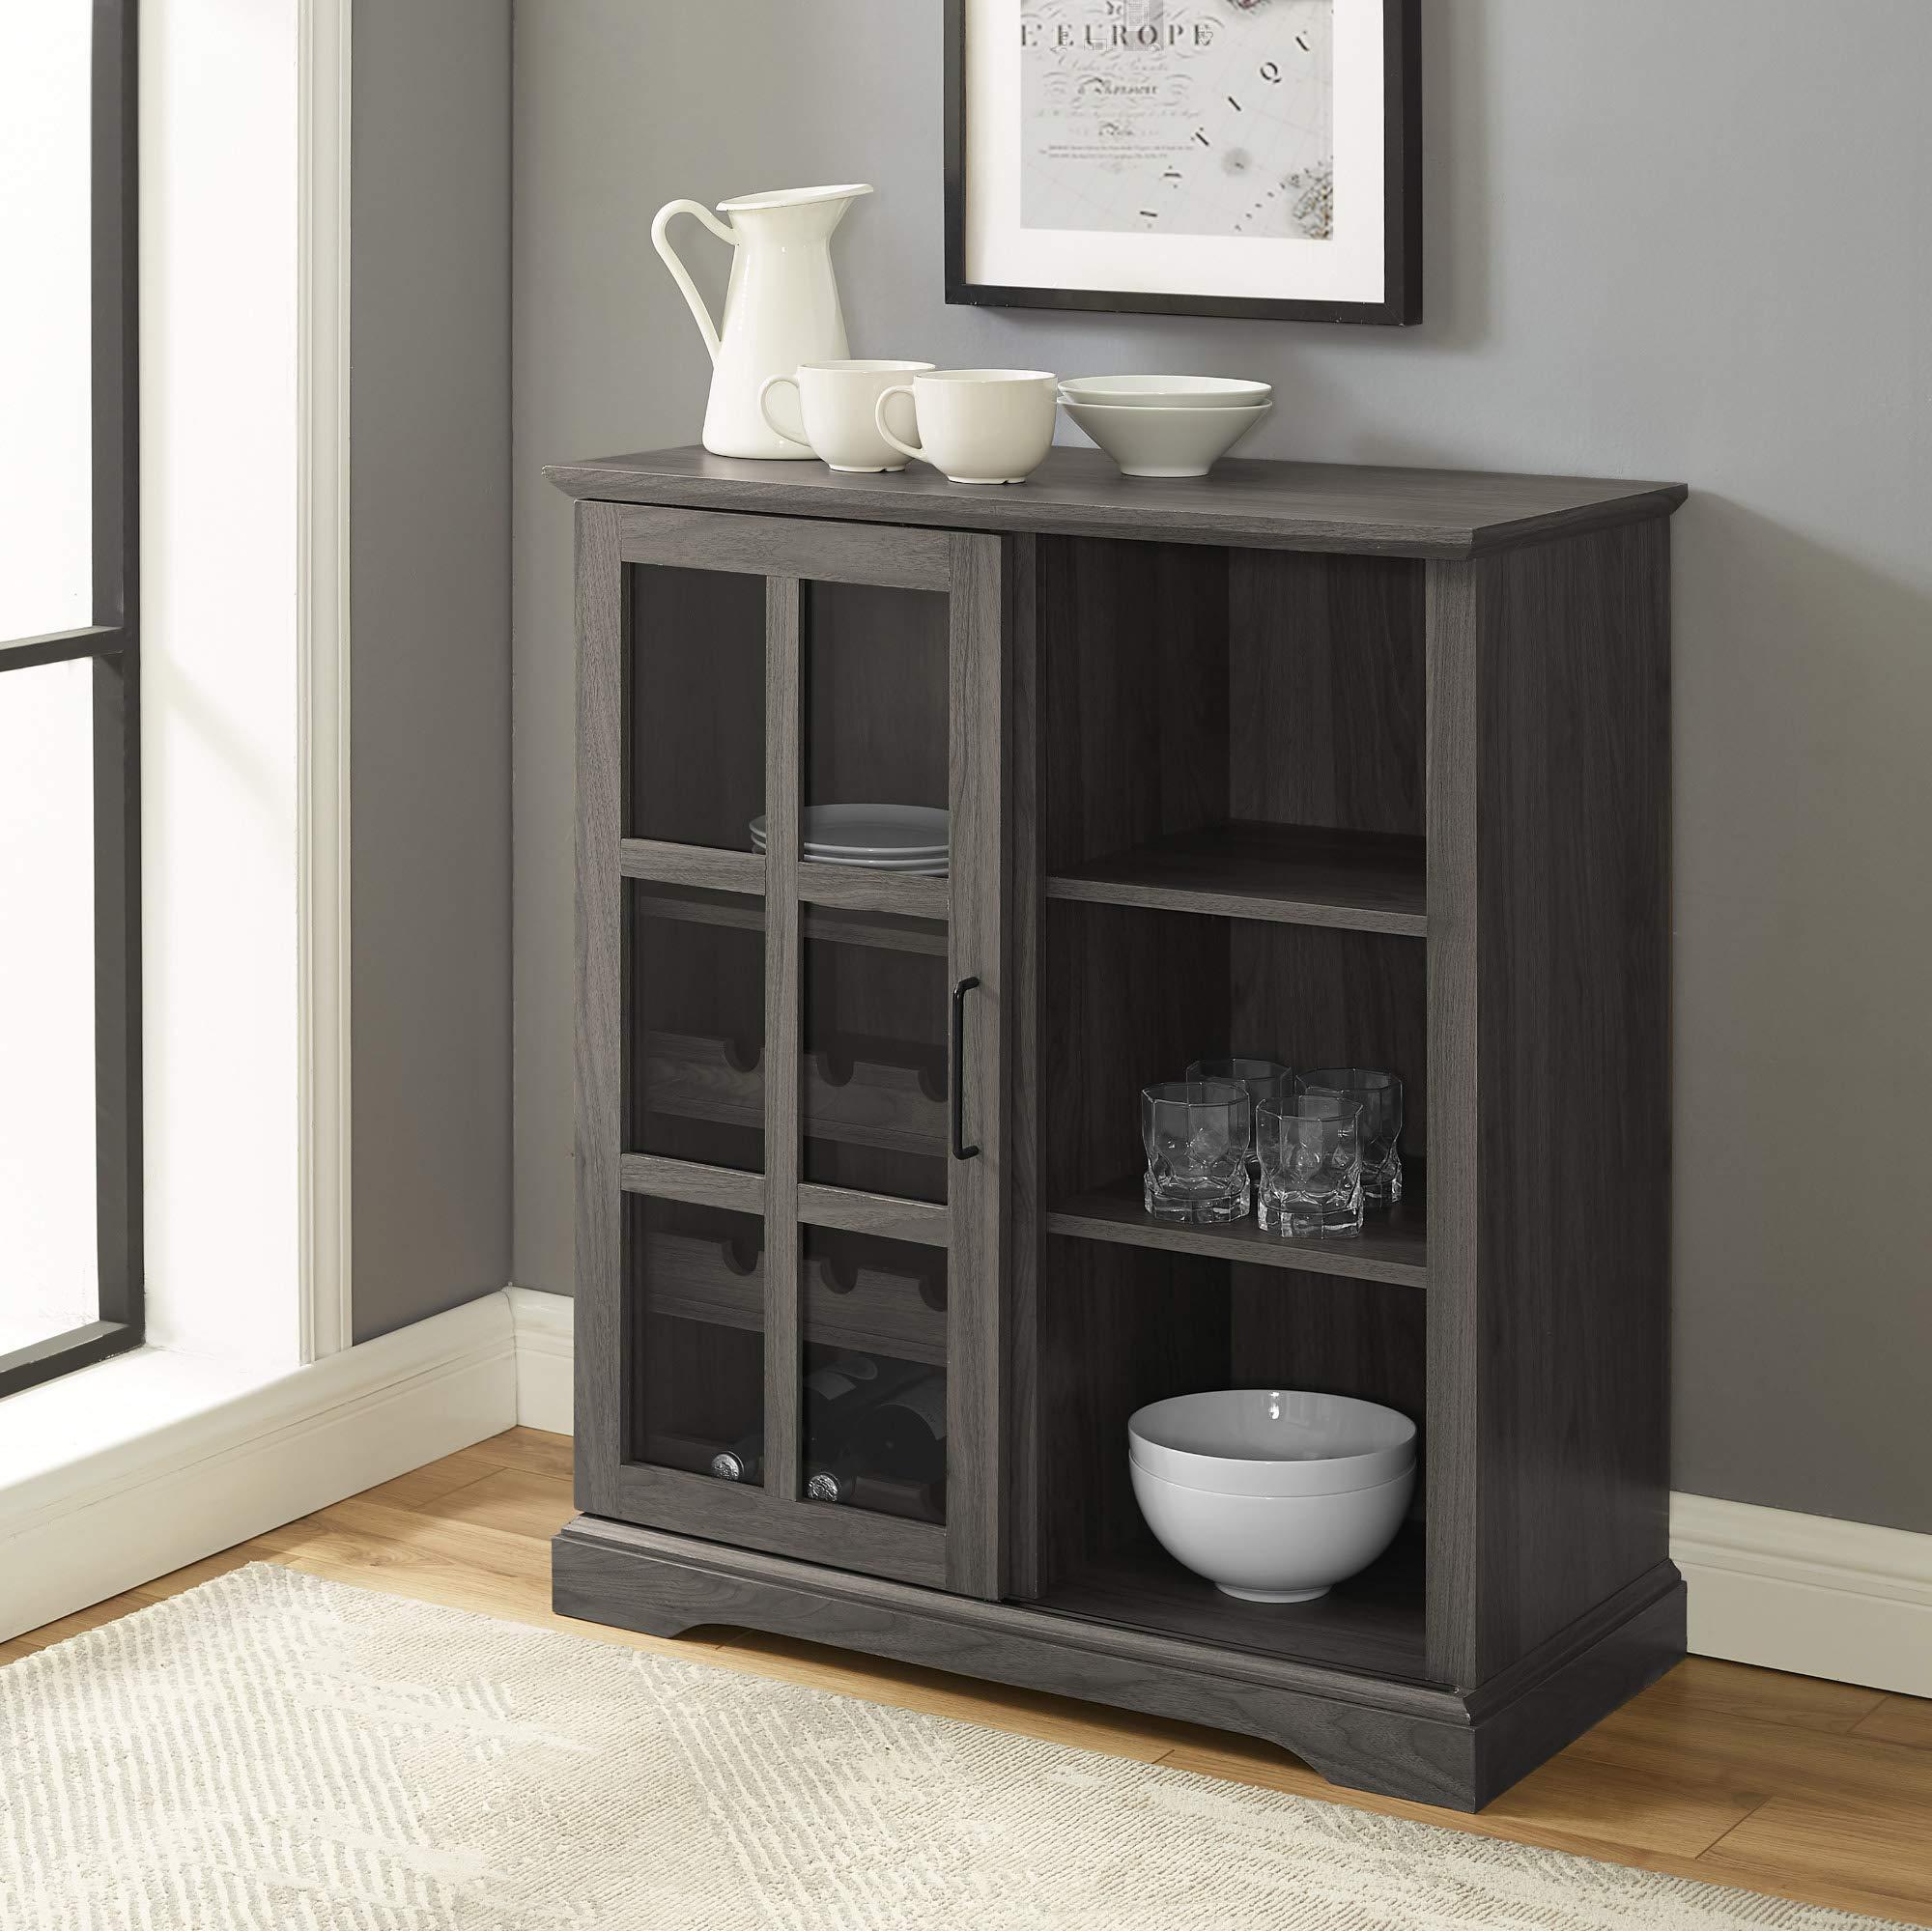 Walker Edison Wood Sliding Glass Bar Cabinet Entryway Serving Wine Storage Doors Dining Room Console, 36 Inch, Slate Grey